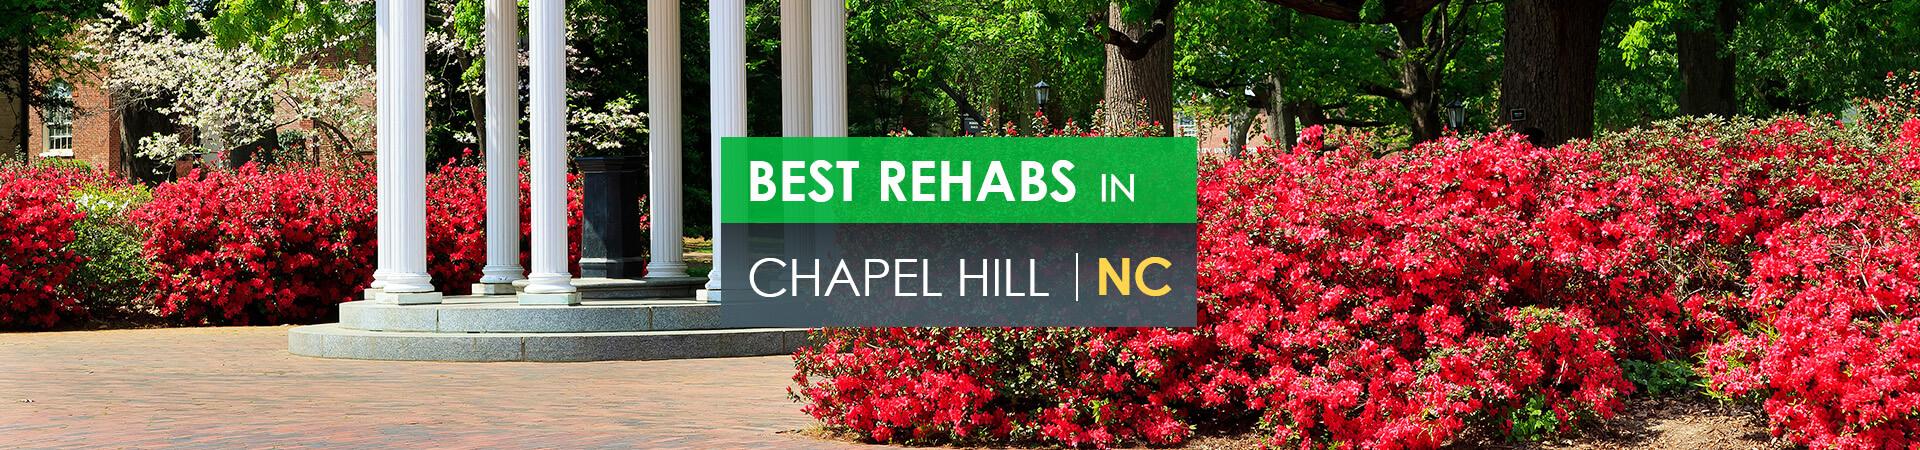 Best rehabs in Chapel Hill, NC